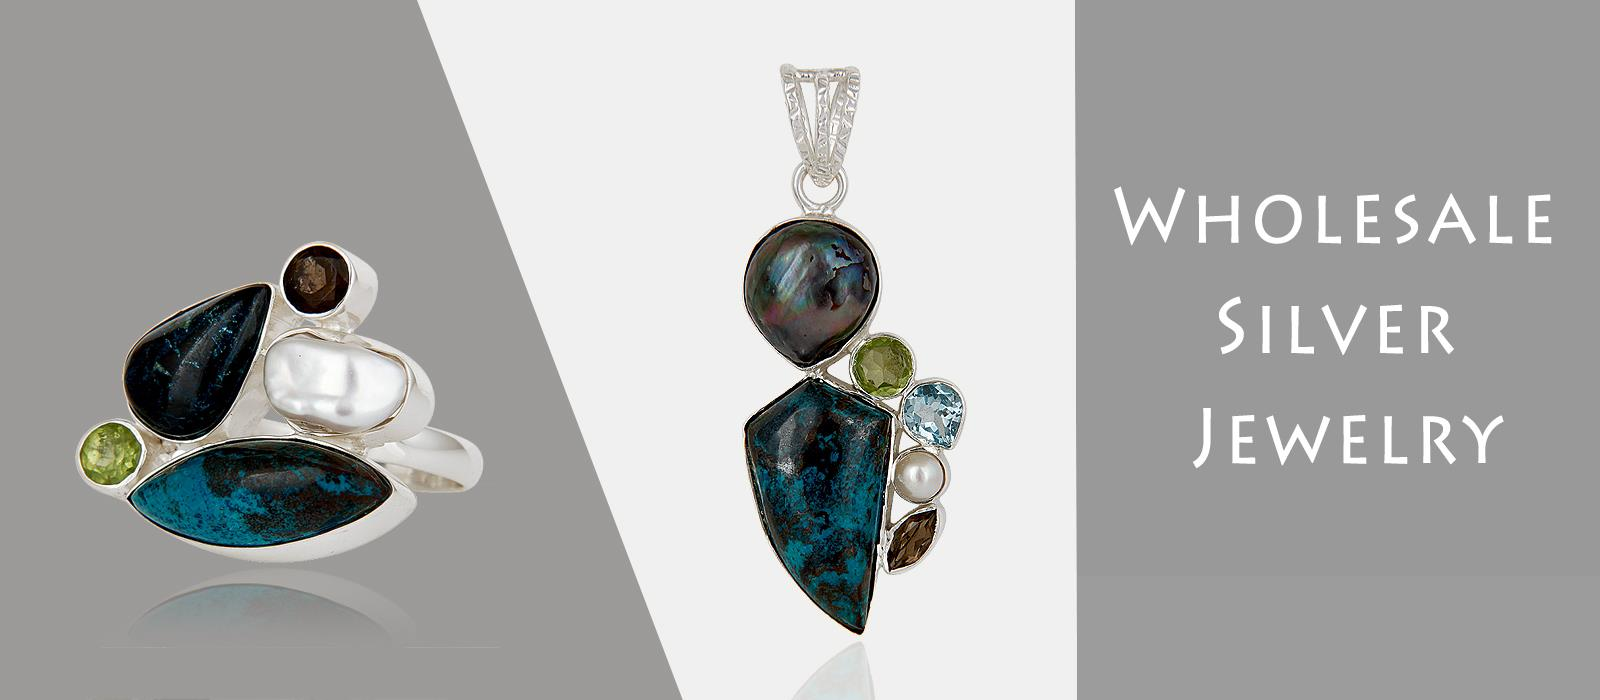 wholesale silver jewelry manufacturer Jaipur, Jaipur Silver Jewelry Suppliers Jaipur, Wholesale Silver Jewelry Supplier India, Indian Wholesale Silver Jewelry, Wholesale Indian Silver Jewelry, Silver Jewelry Wholesale India, Silver Jewelry Wholesale Supplier Jaipur